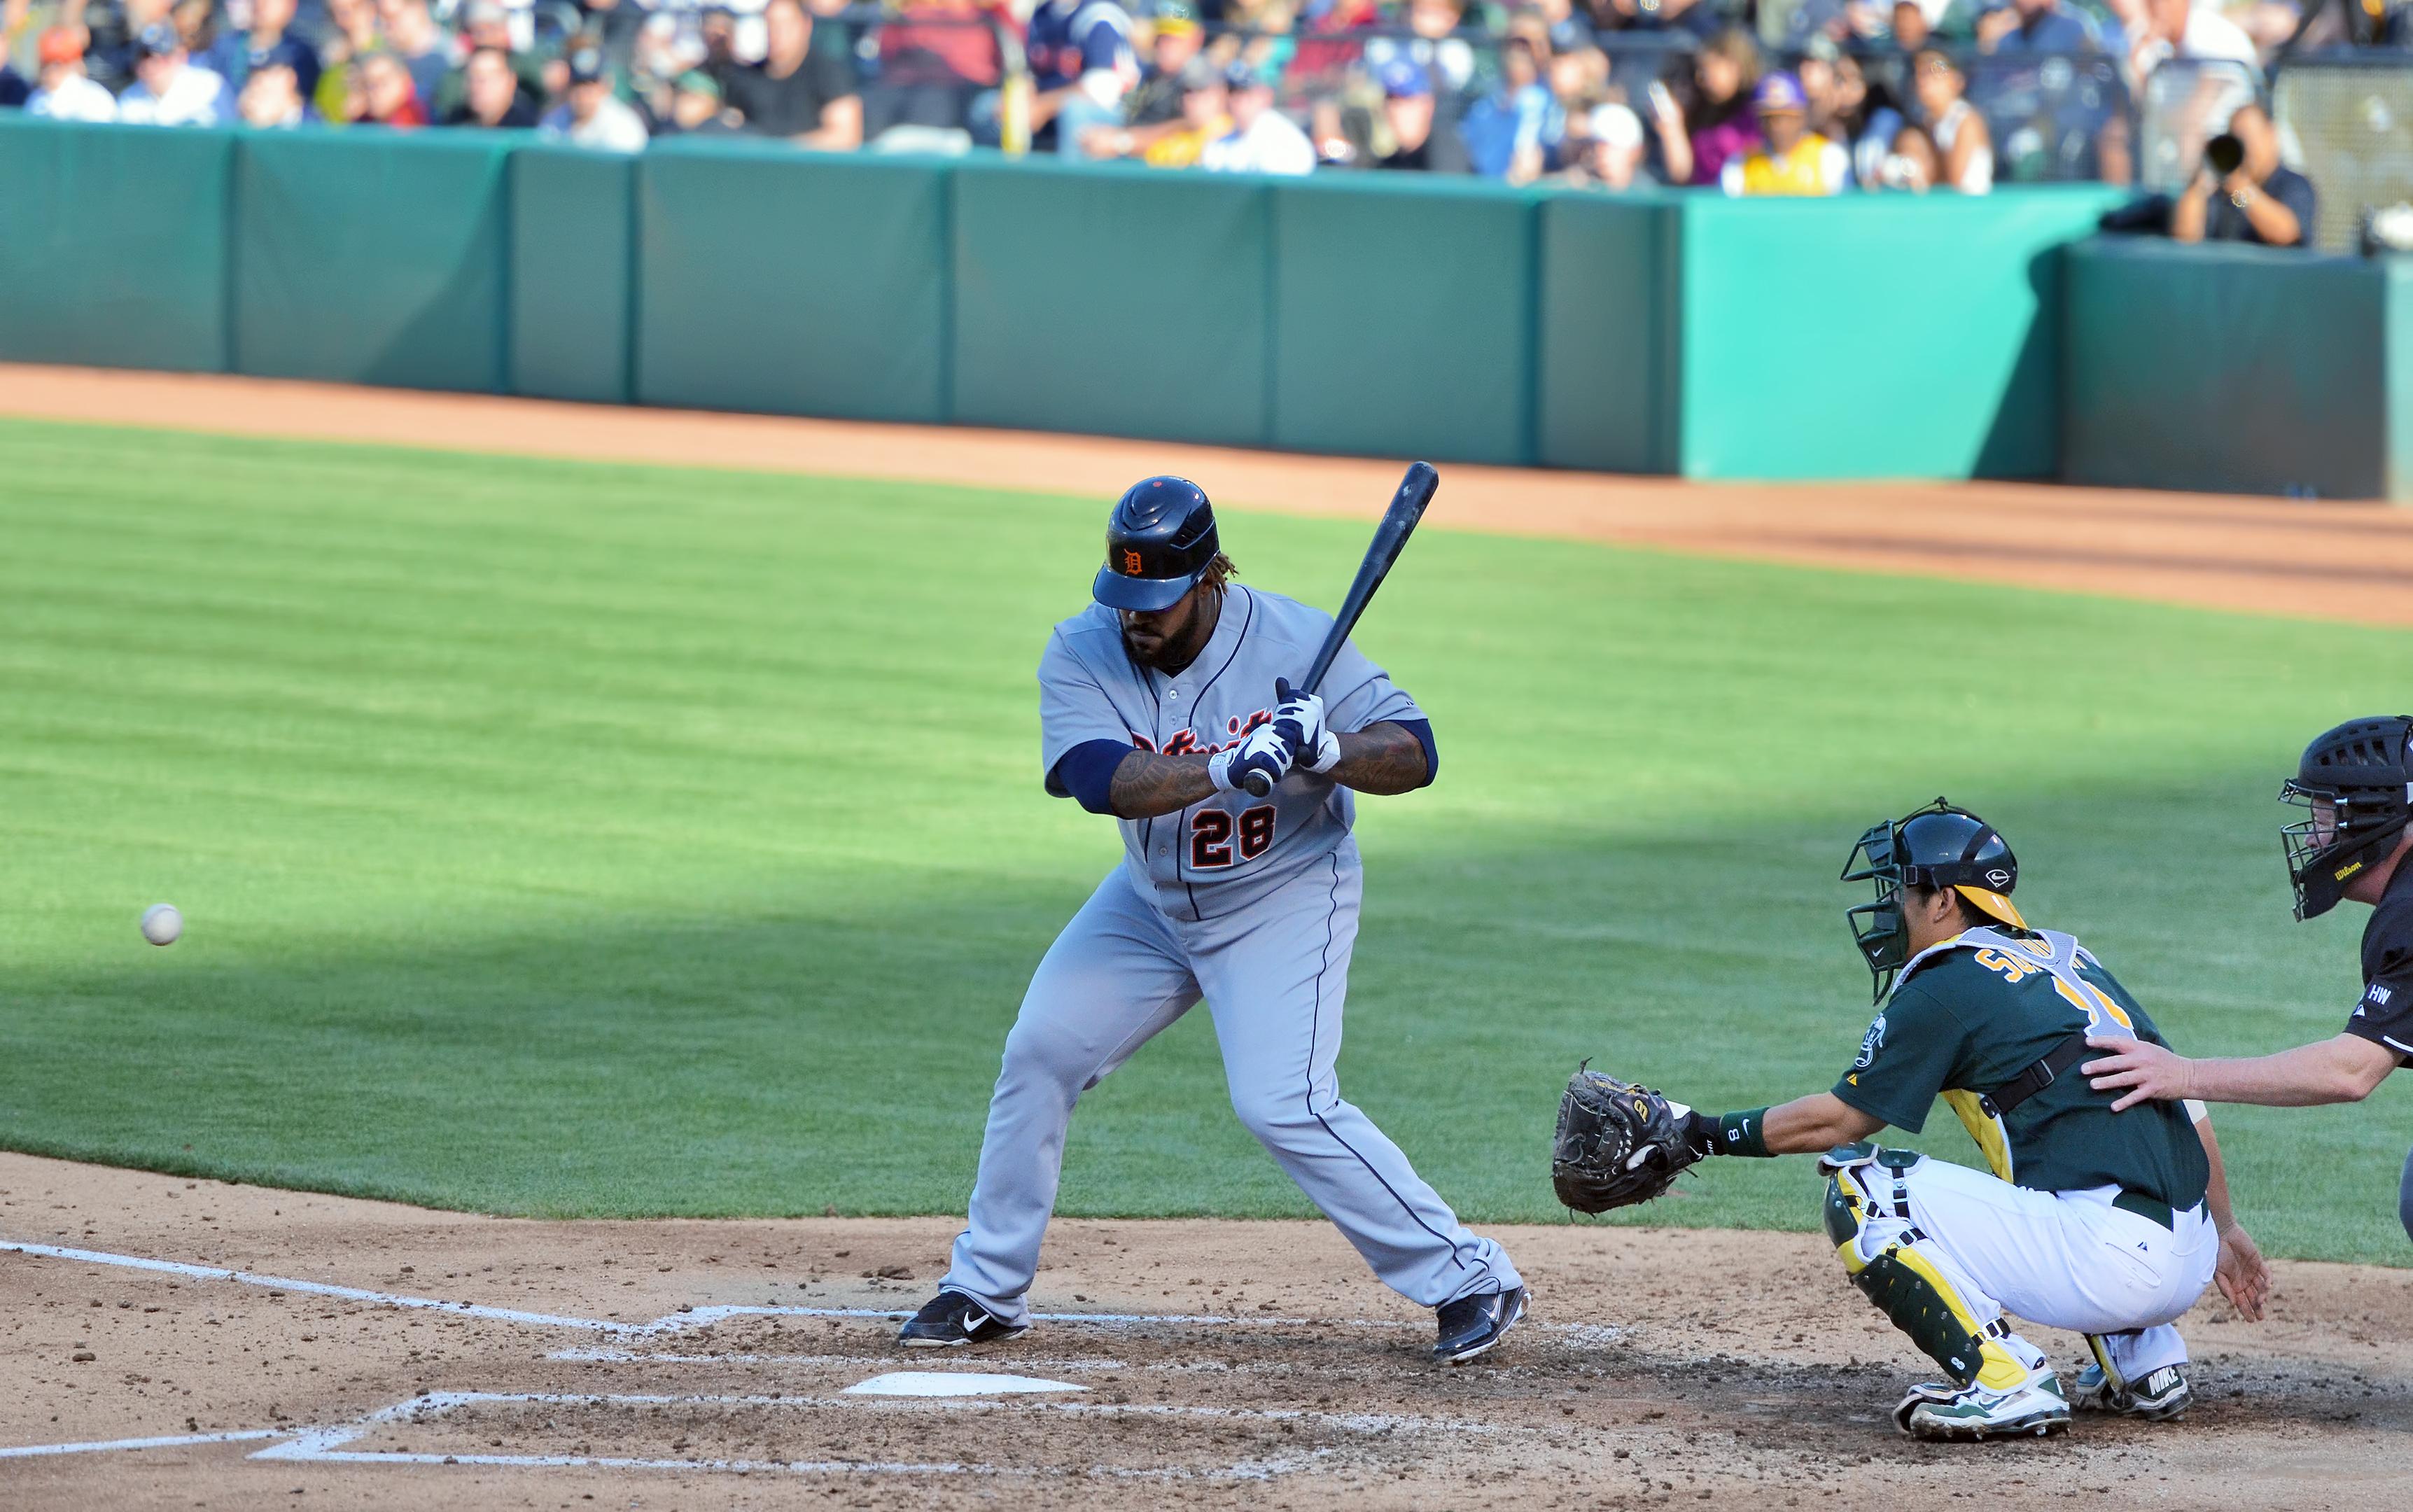 oakland prince fielder kurt suzuki baseball mlb